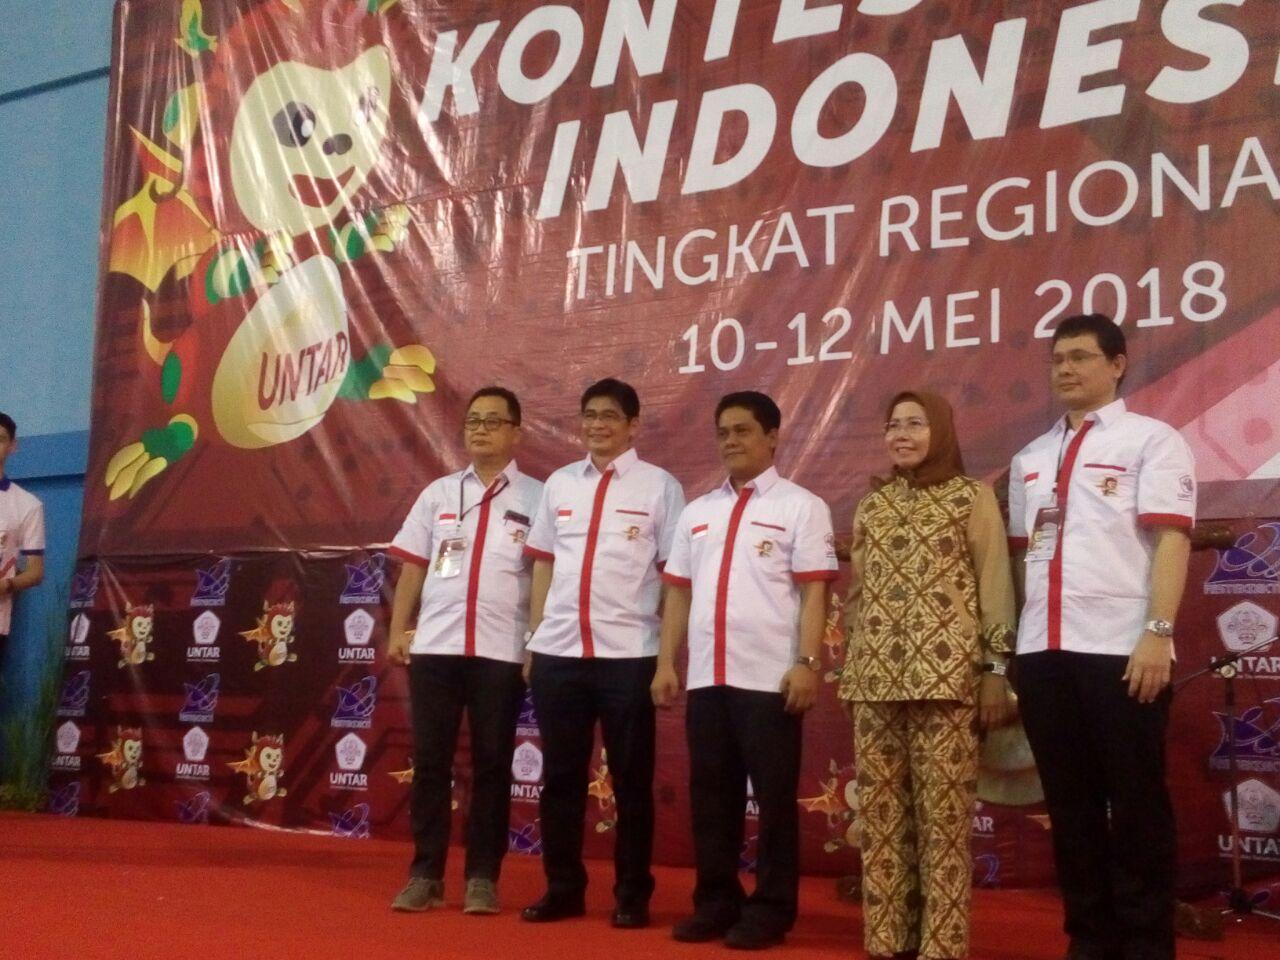 https: img.okeinfo.net content 2018 05 12 65 1897418 tuan-rumah-kontes-robot-indonesia-untar-dukung-pengembangan-sdm-menuju-industri-4-0-RMITLUqCZy.jpeg